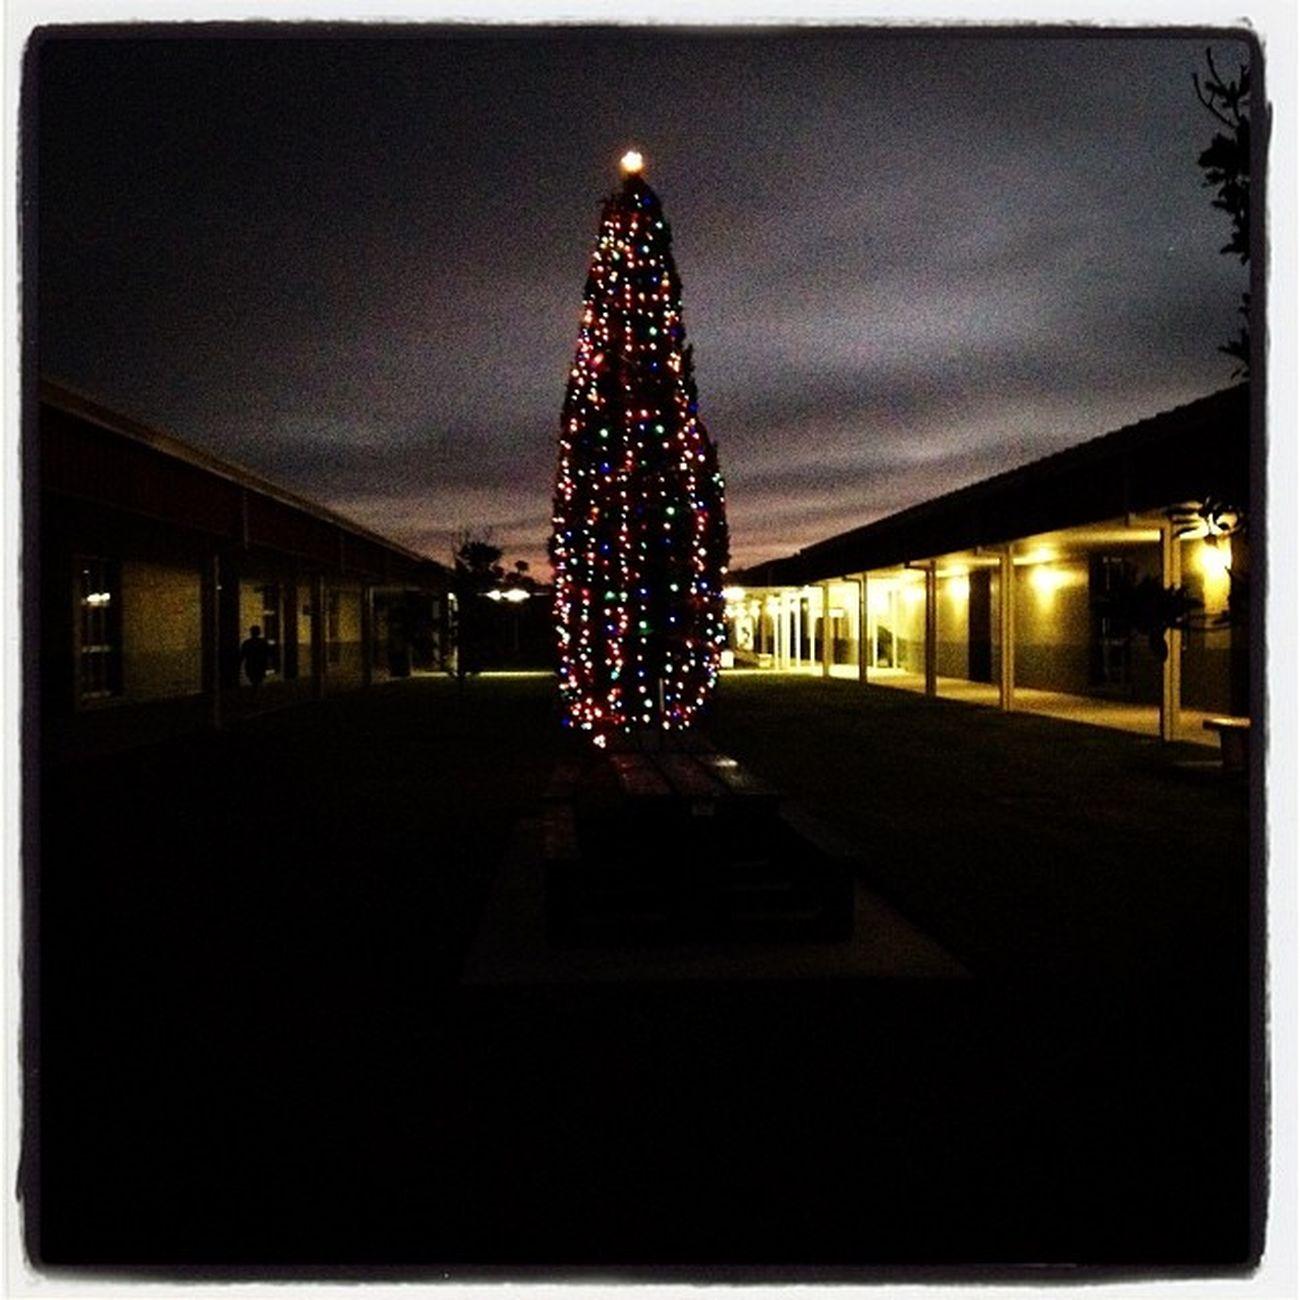 Christmastreeatschool Centercourt Oaksteadelementary @pascoschools Pretty lights beautifulmorning december cool christmasisin21days yikes